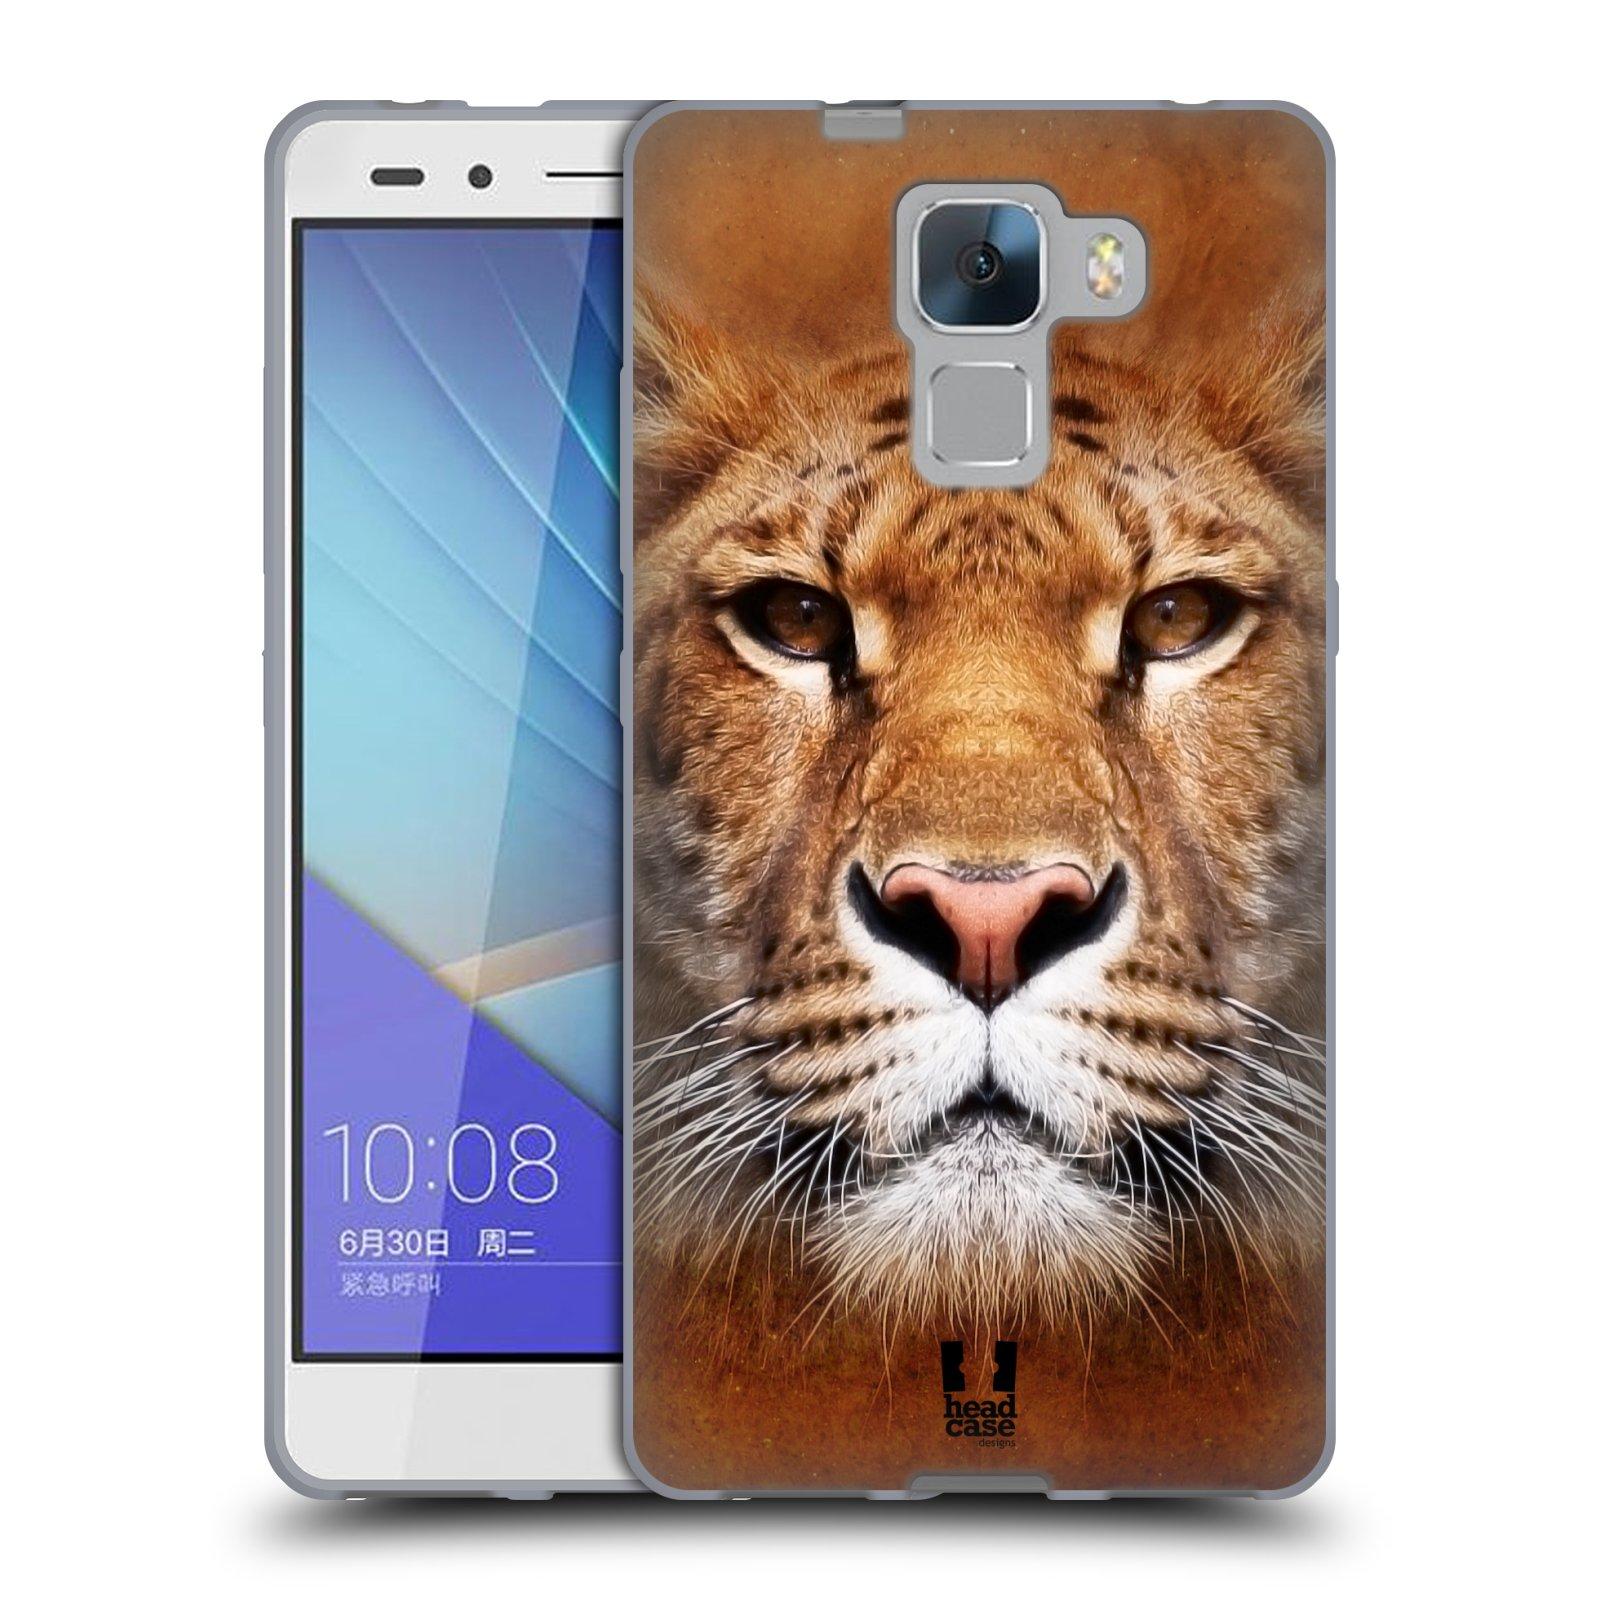 HEAD CASE silikonový obal na mobil HUAWEI HONOR 7 vzor Zvířecí tváře Sibiřský tygr